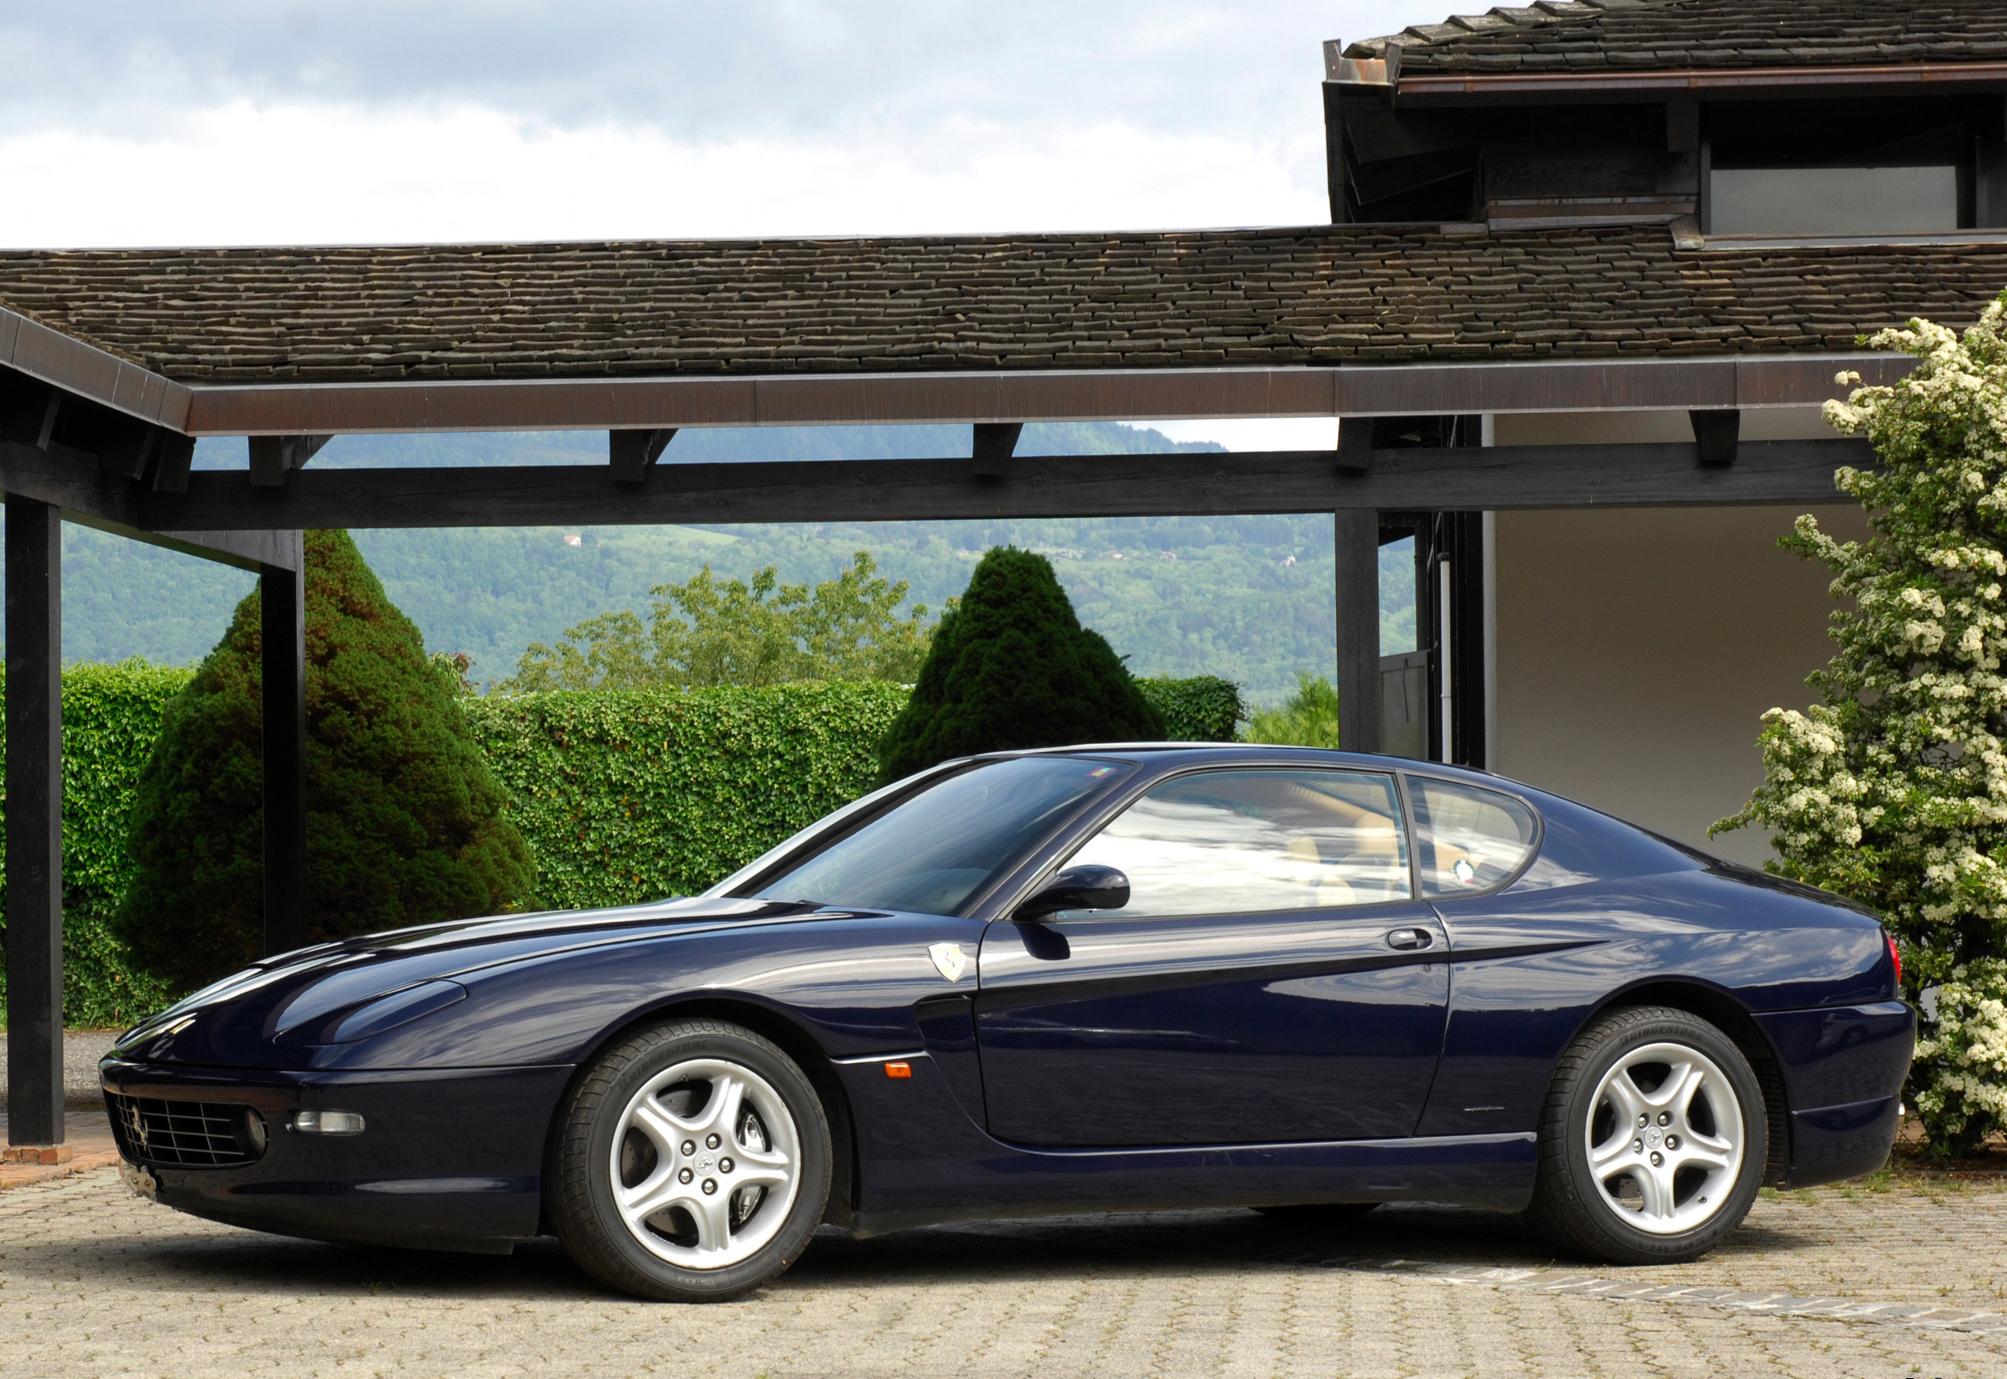 wallpapers_ferrari_456_1998_1 Elegant Ferrari F 108 Al-mondial 8 Cars Trend